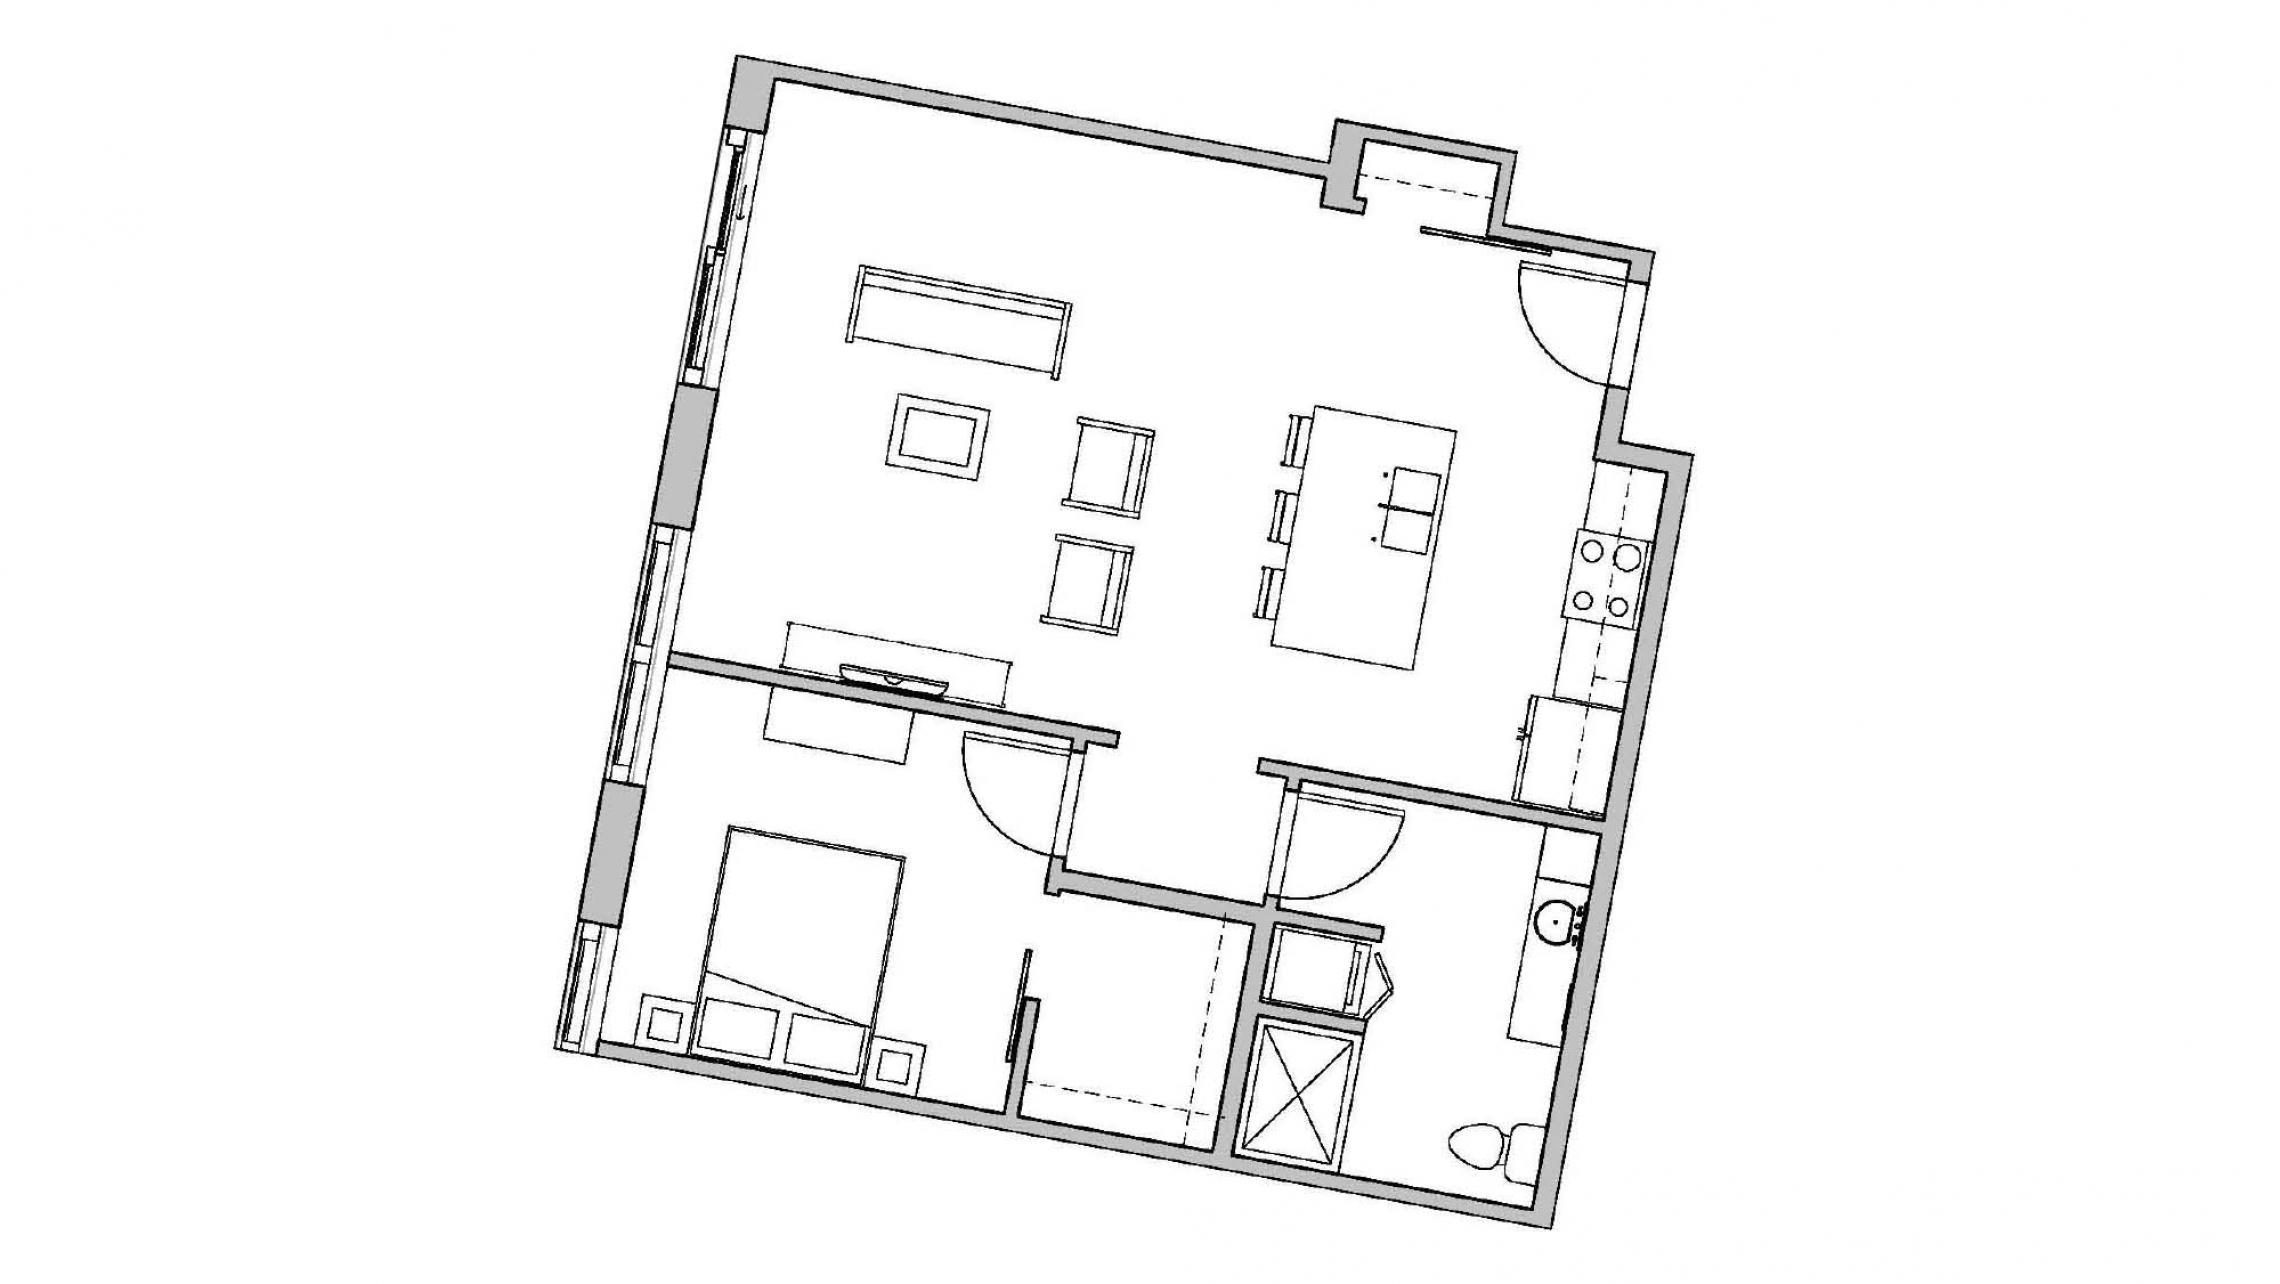 ULI - Seven27 - Apartment 531 - One Bedroom - One Bathroom